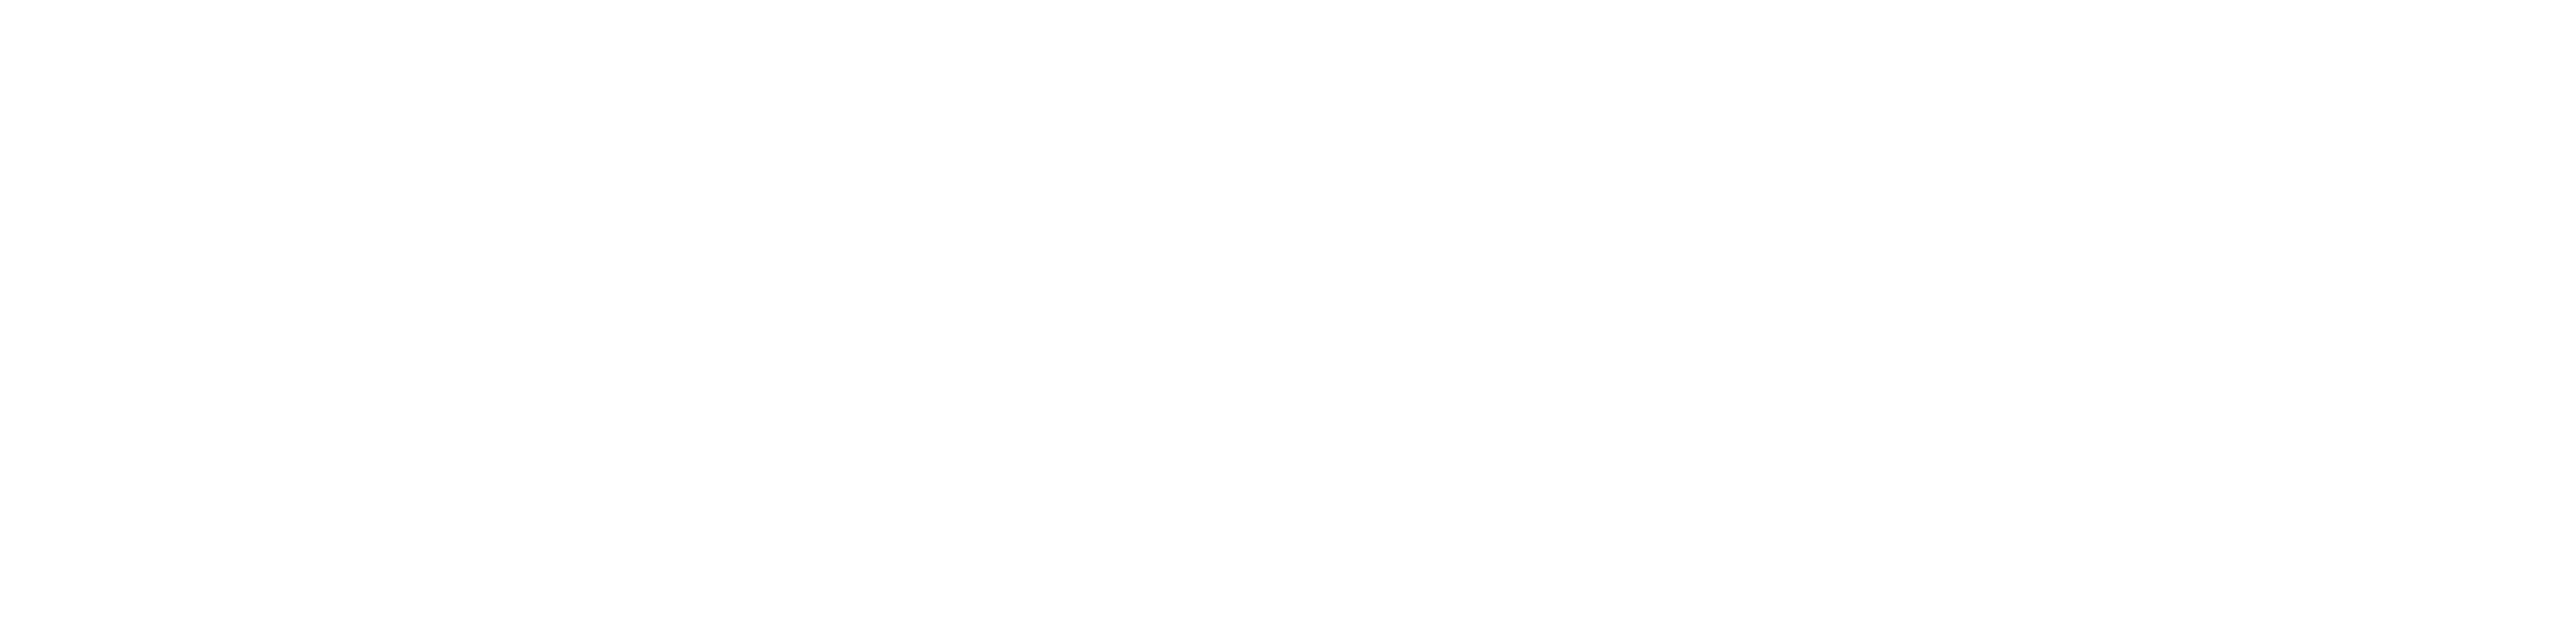 Lisa Maire Runfola